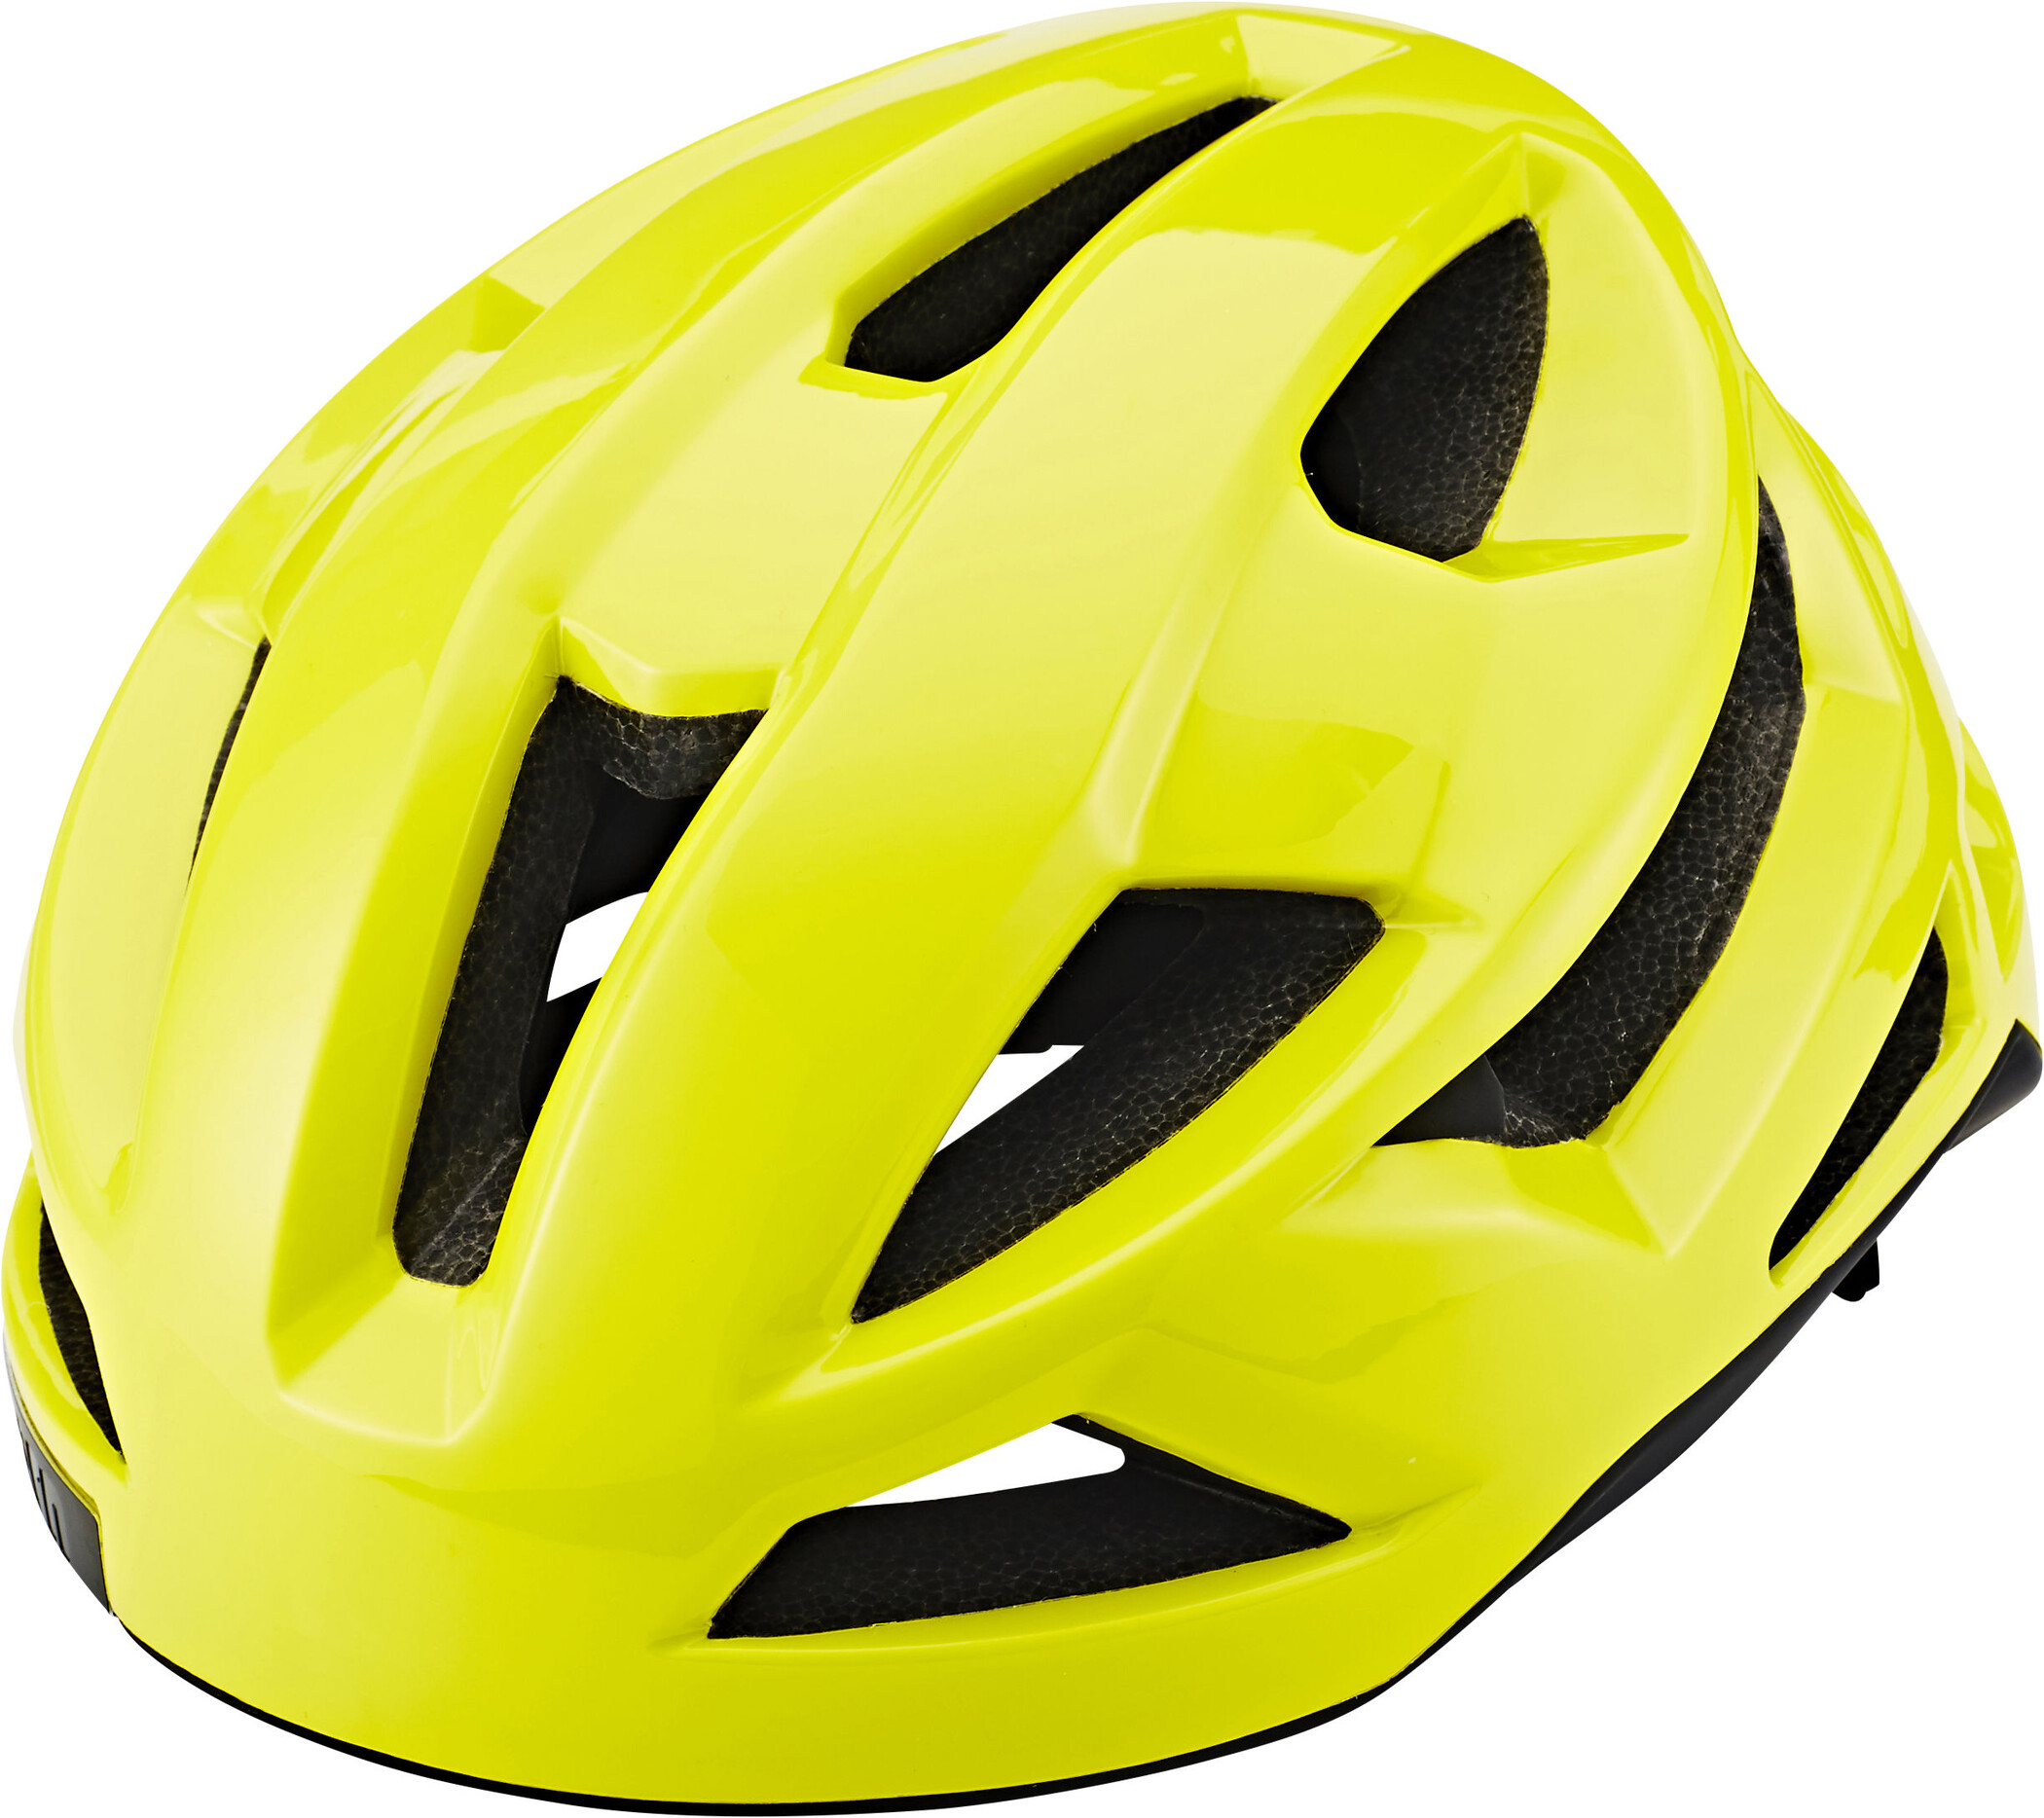 Bern FL-1 Cykelhjelm, neon yellow/glänzend | Helmets